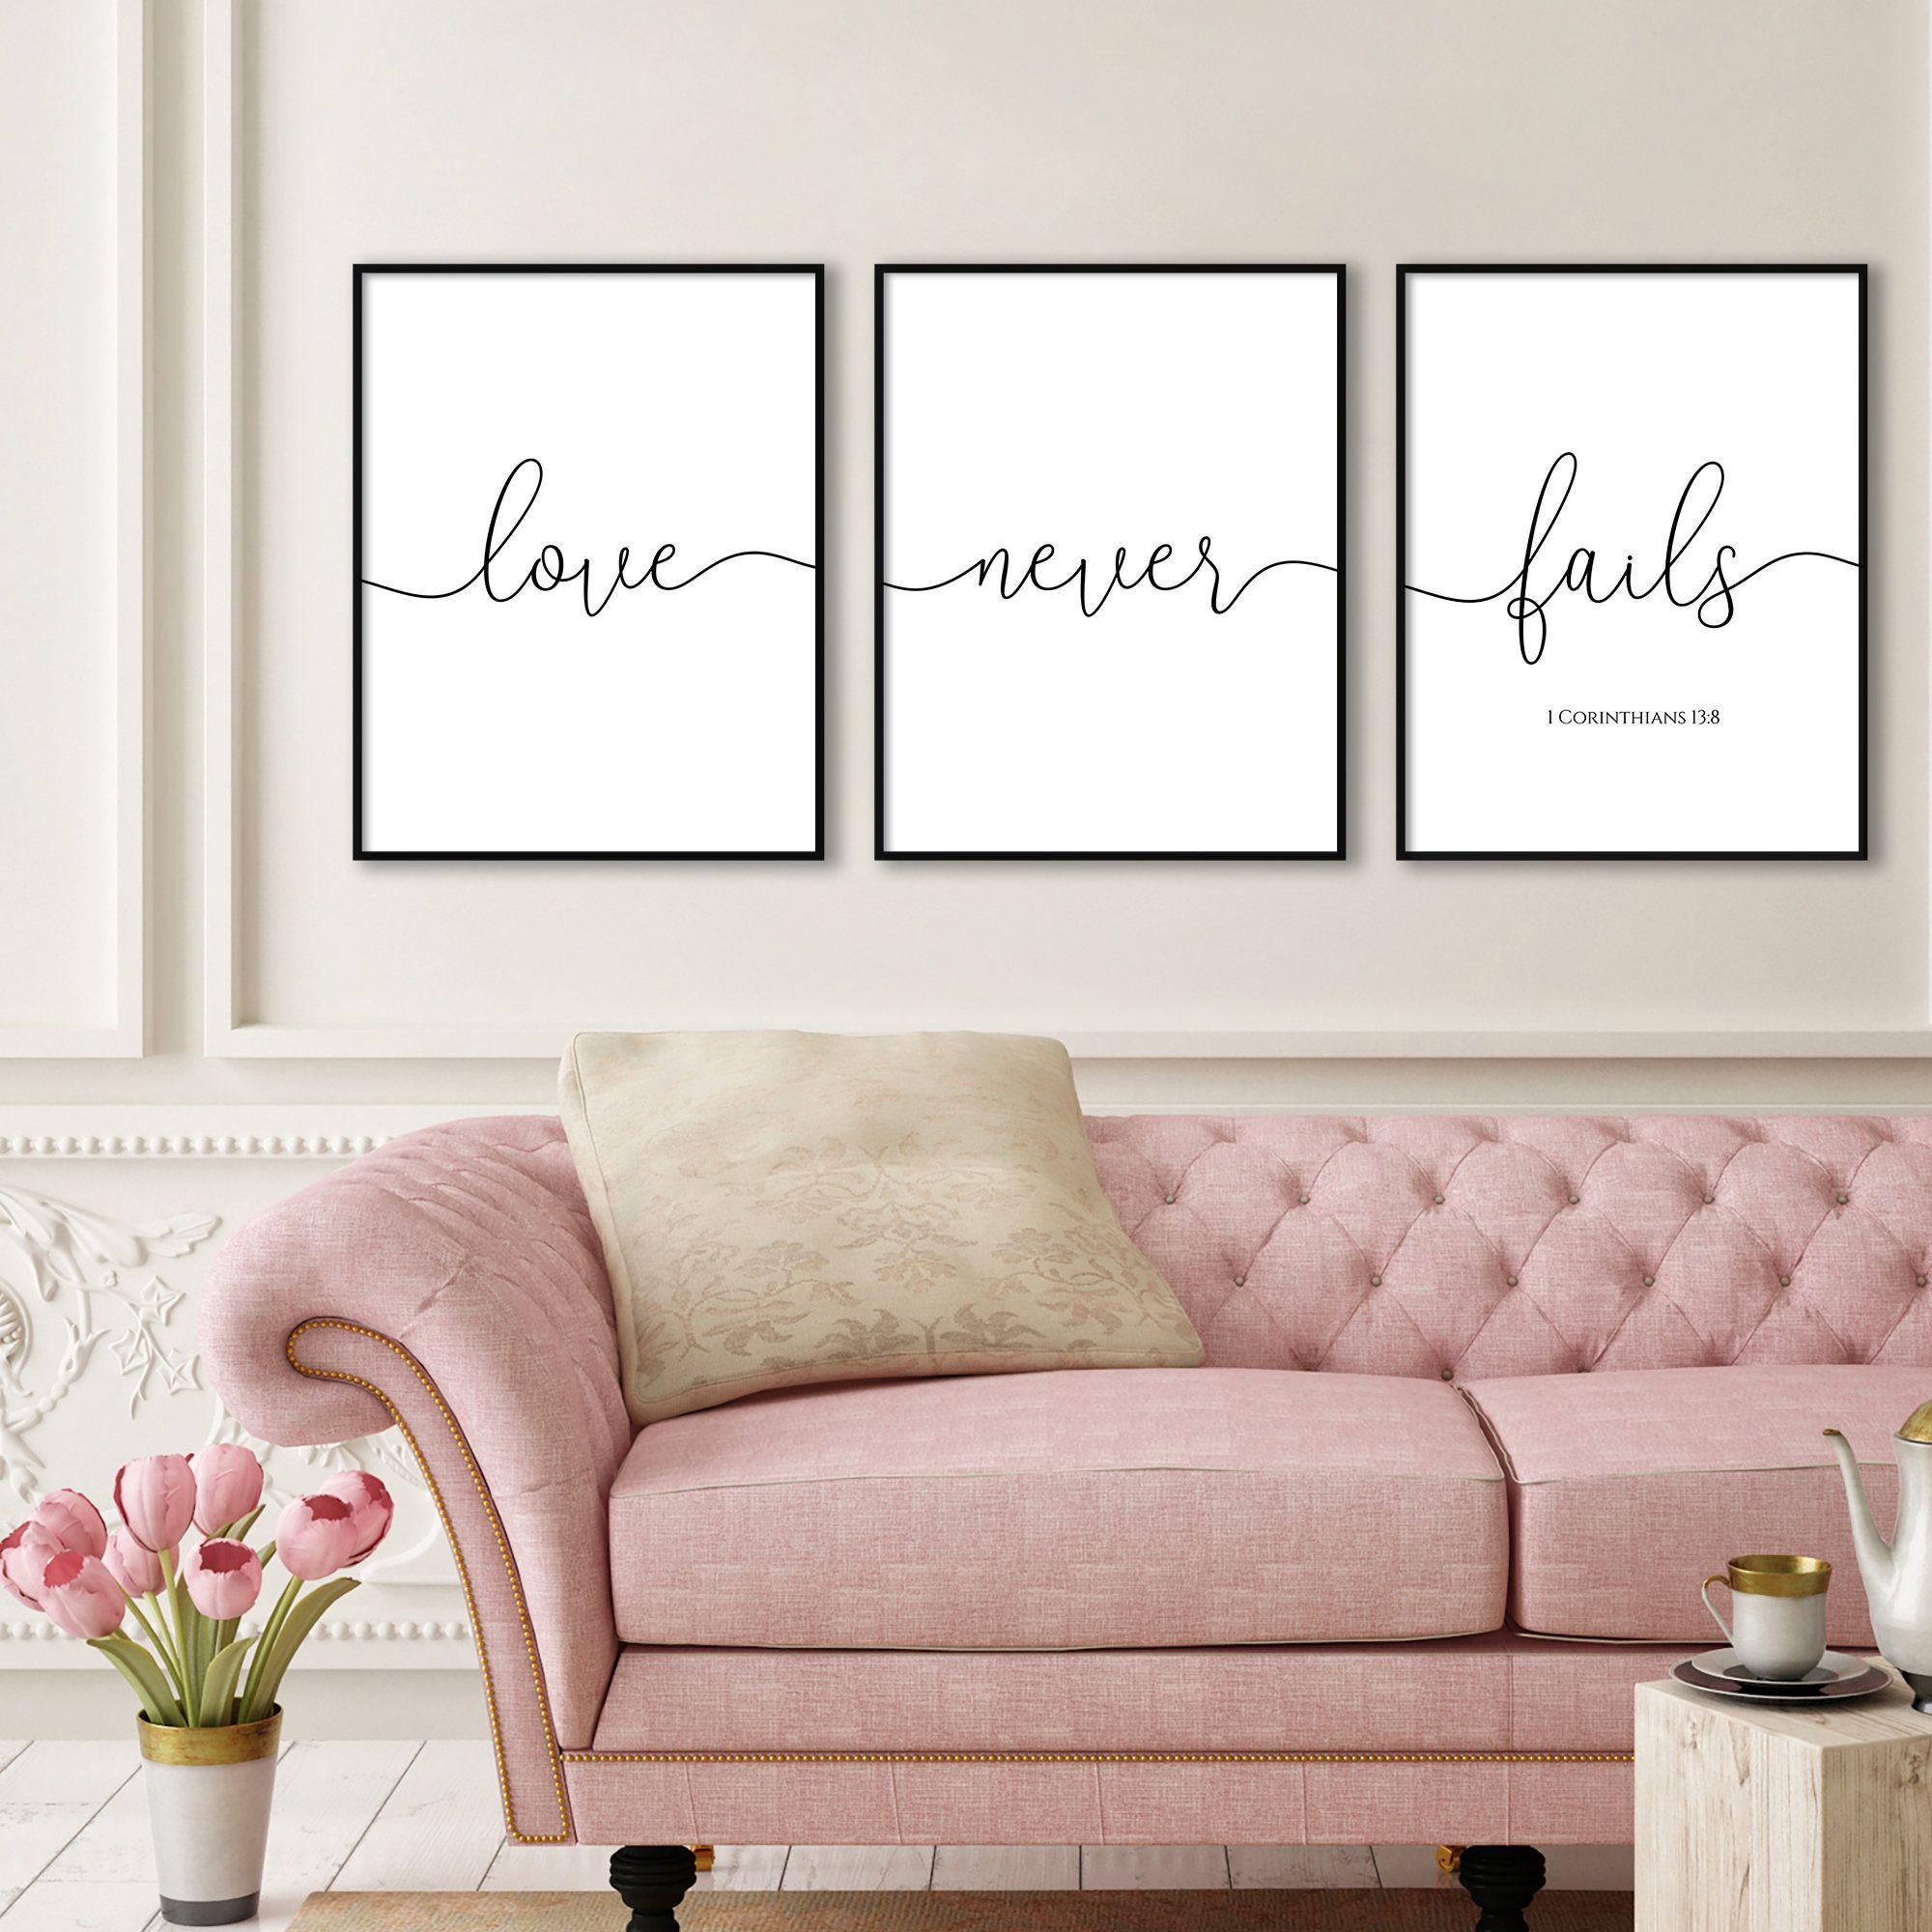 Love Never Fails 1 Corinthians 13 8 Quote Print Triptych Etsy Christian Wall Art Bible Verse Prints Family Decor